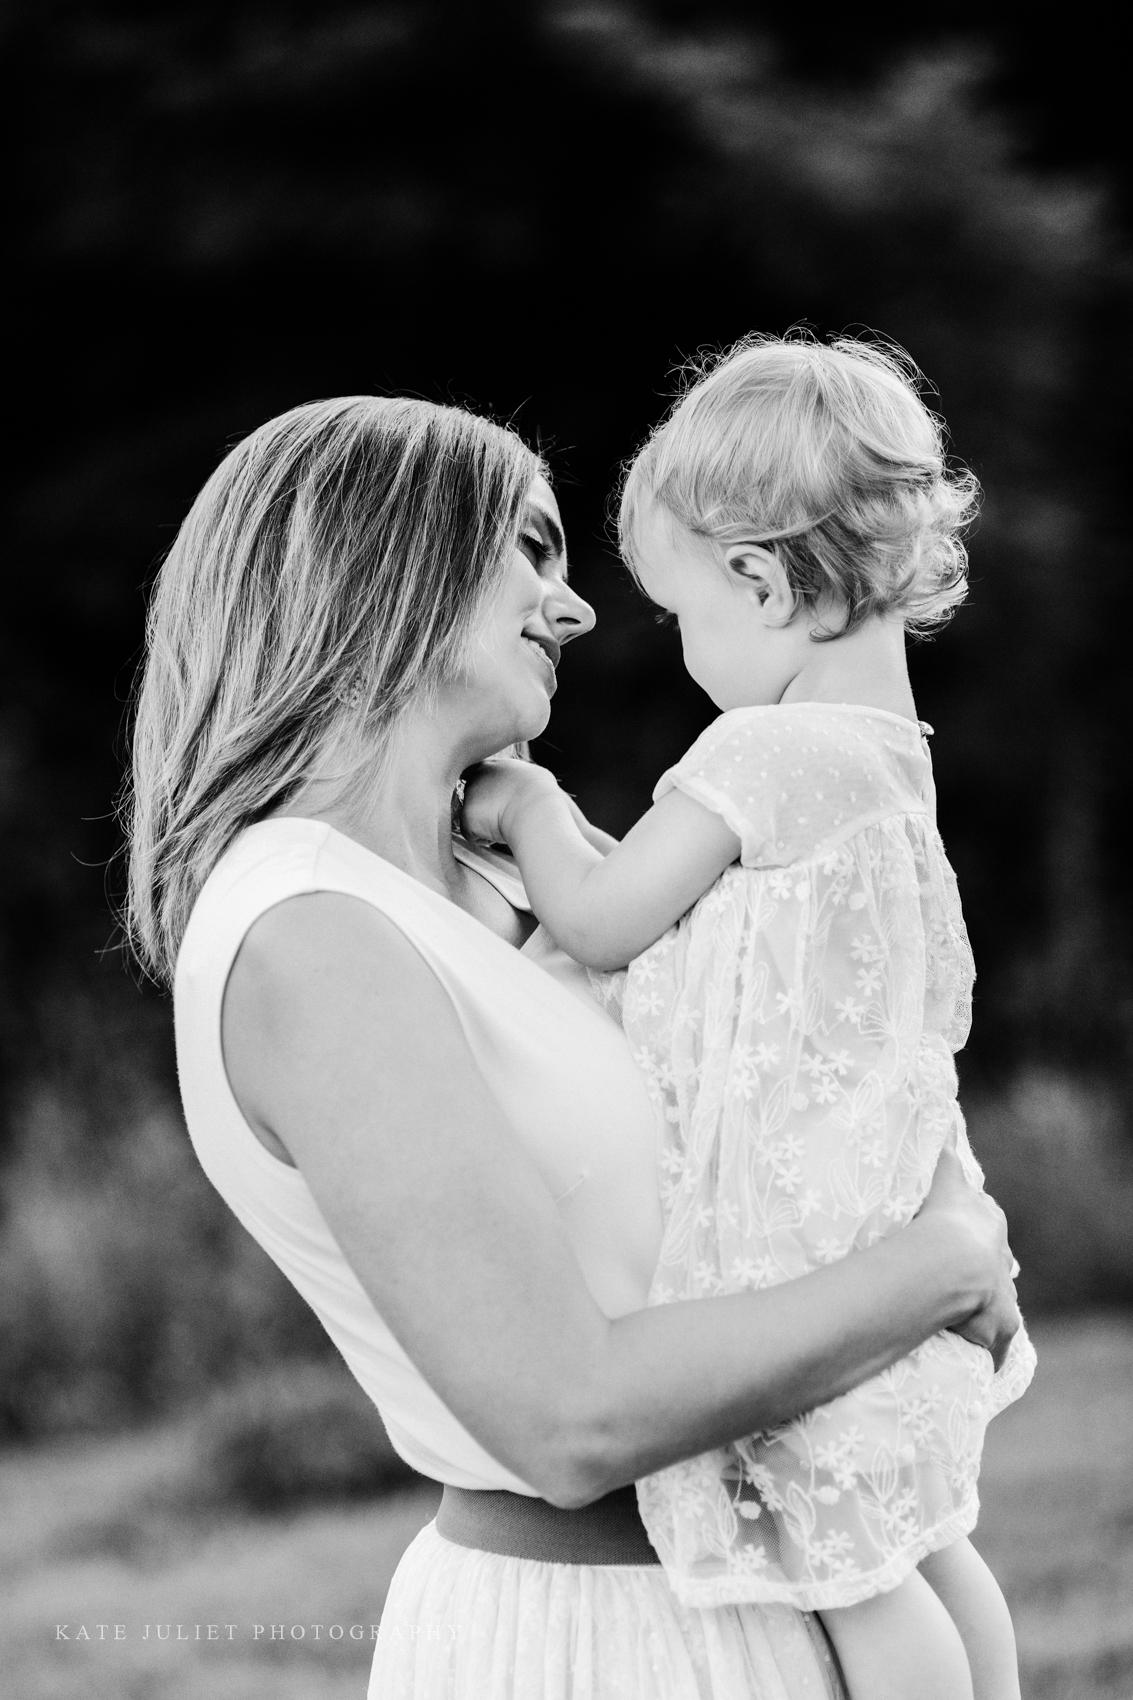 kate_juliet_photography-family-web-16.jpg